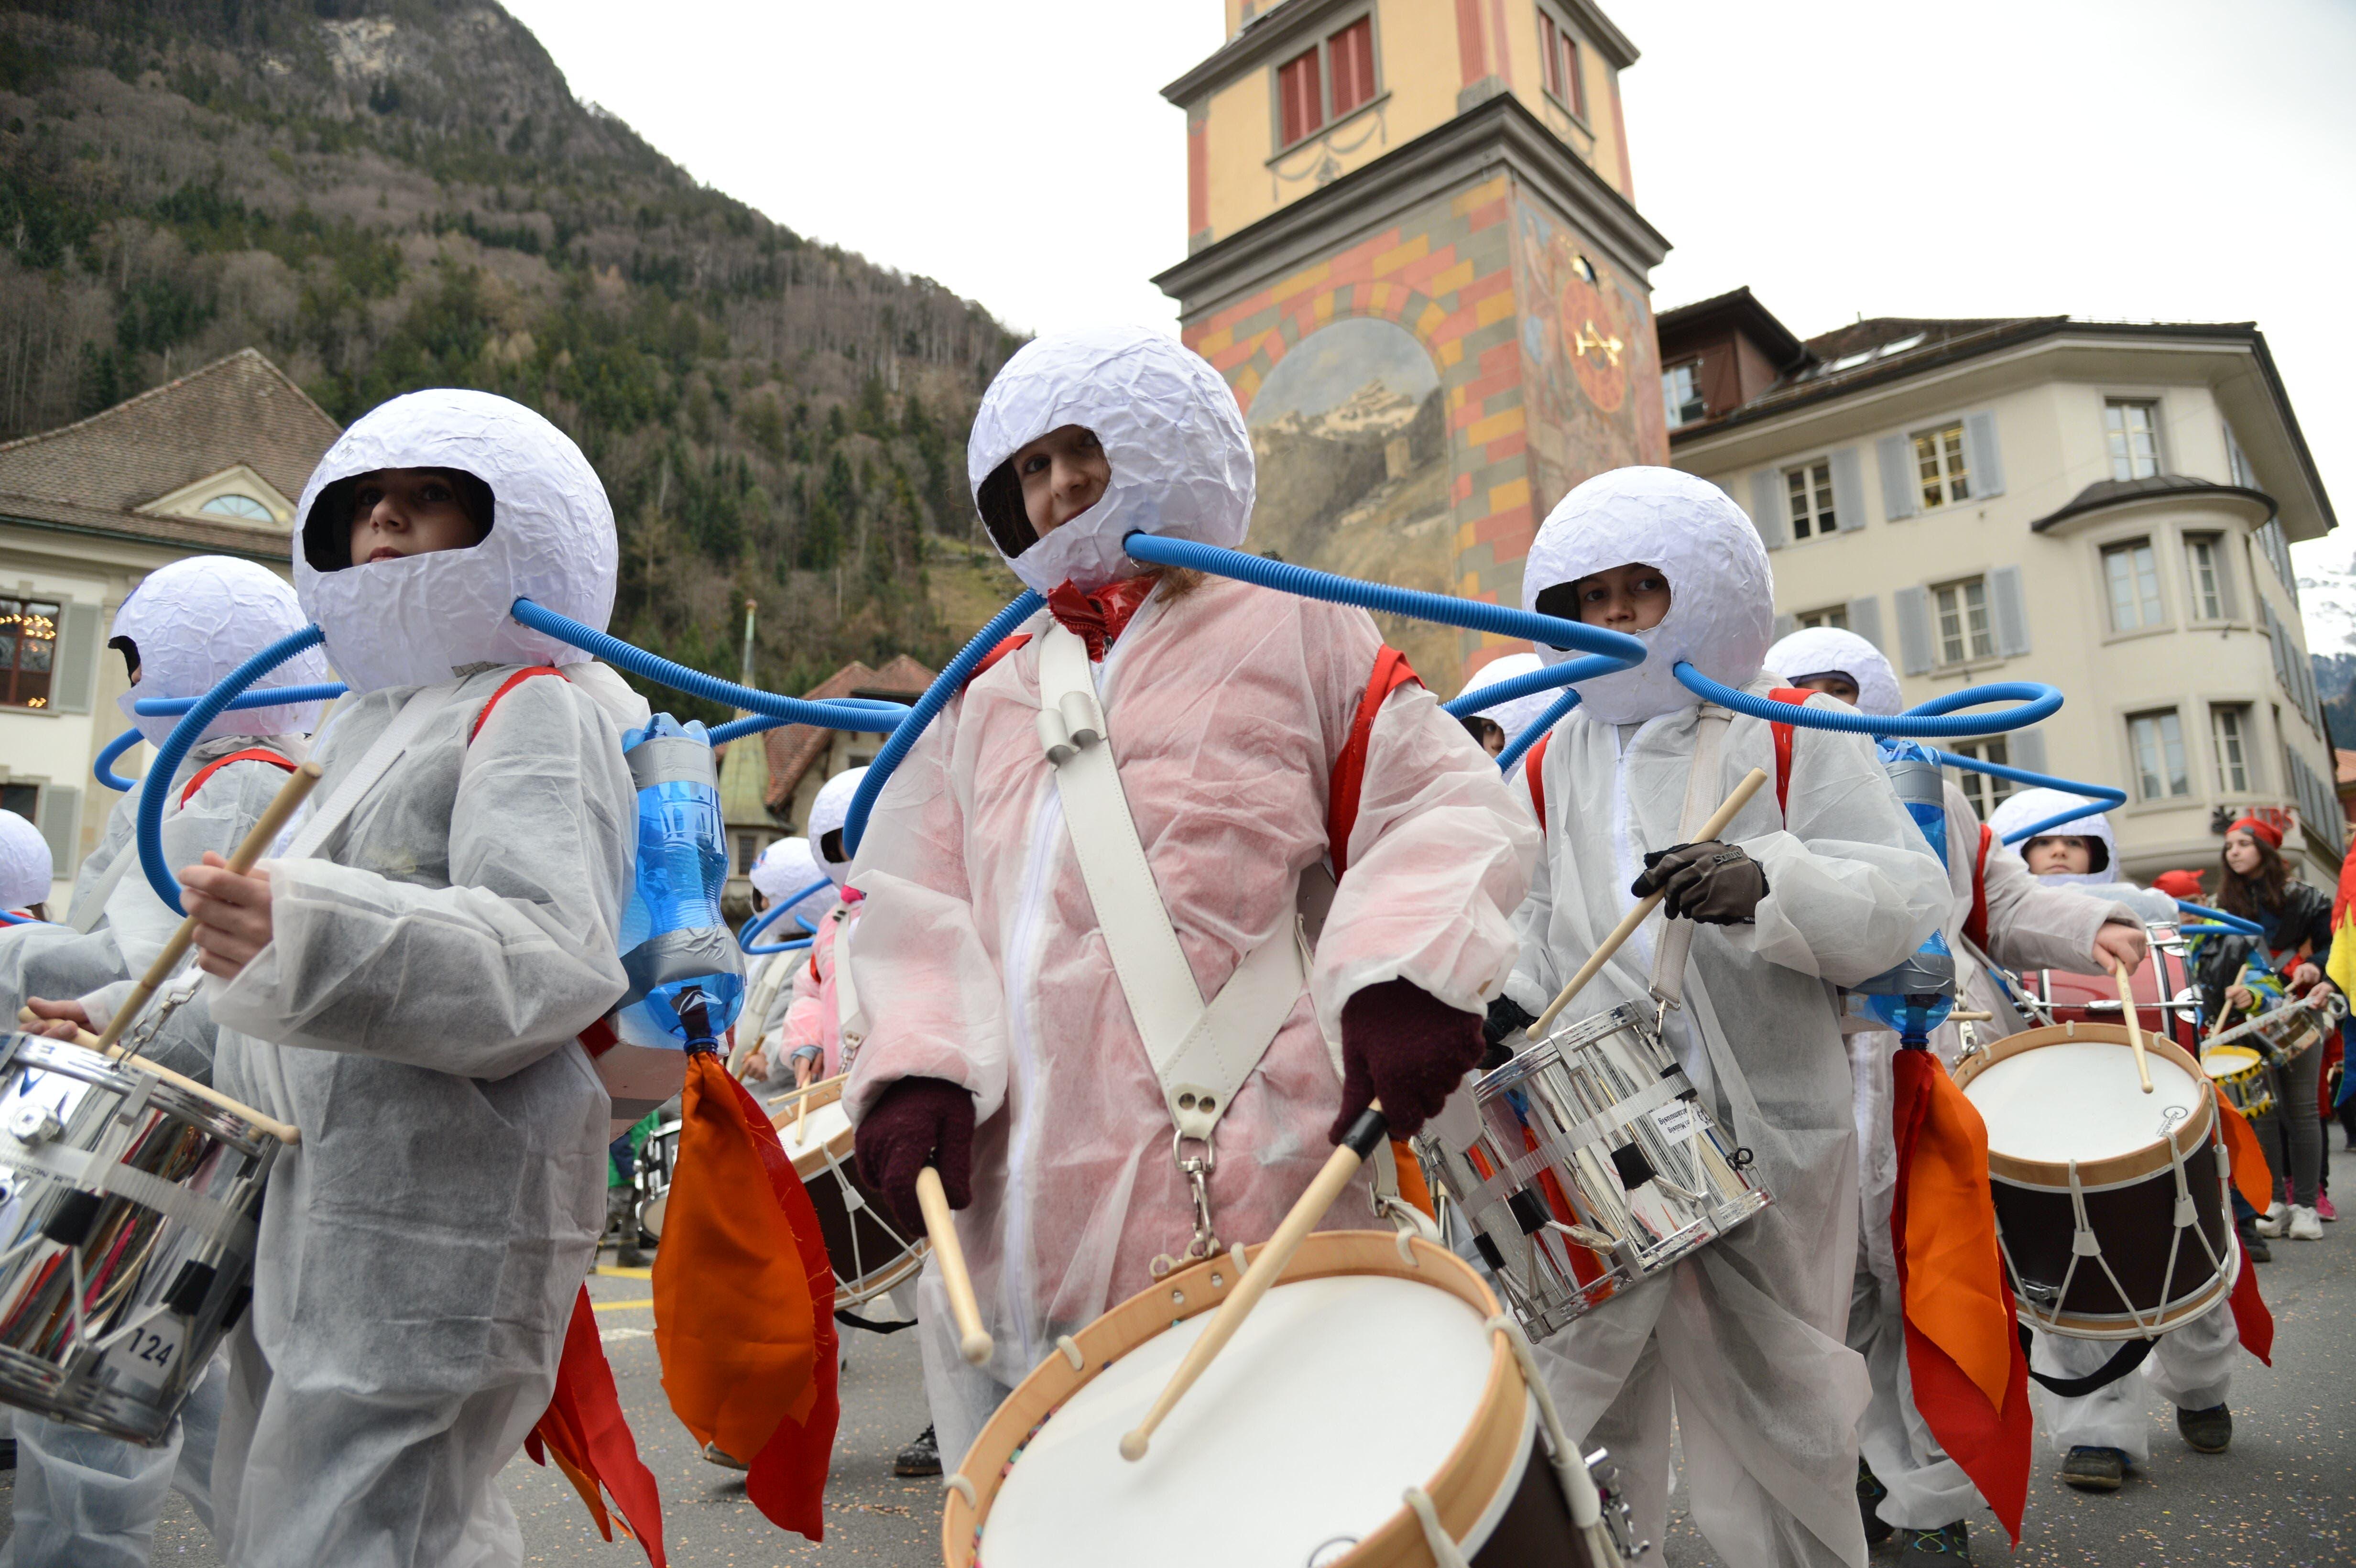 Astronauten trommeln an der Schulkatzenmusik lautstark mit.